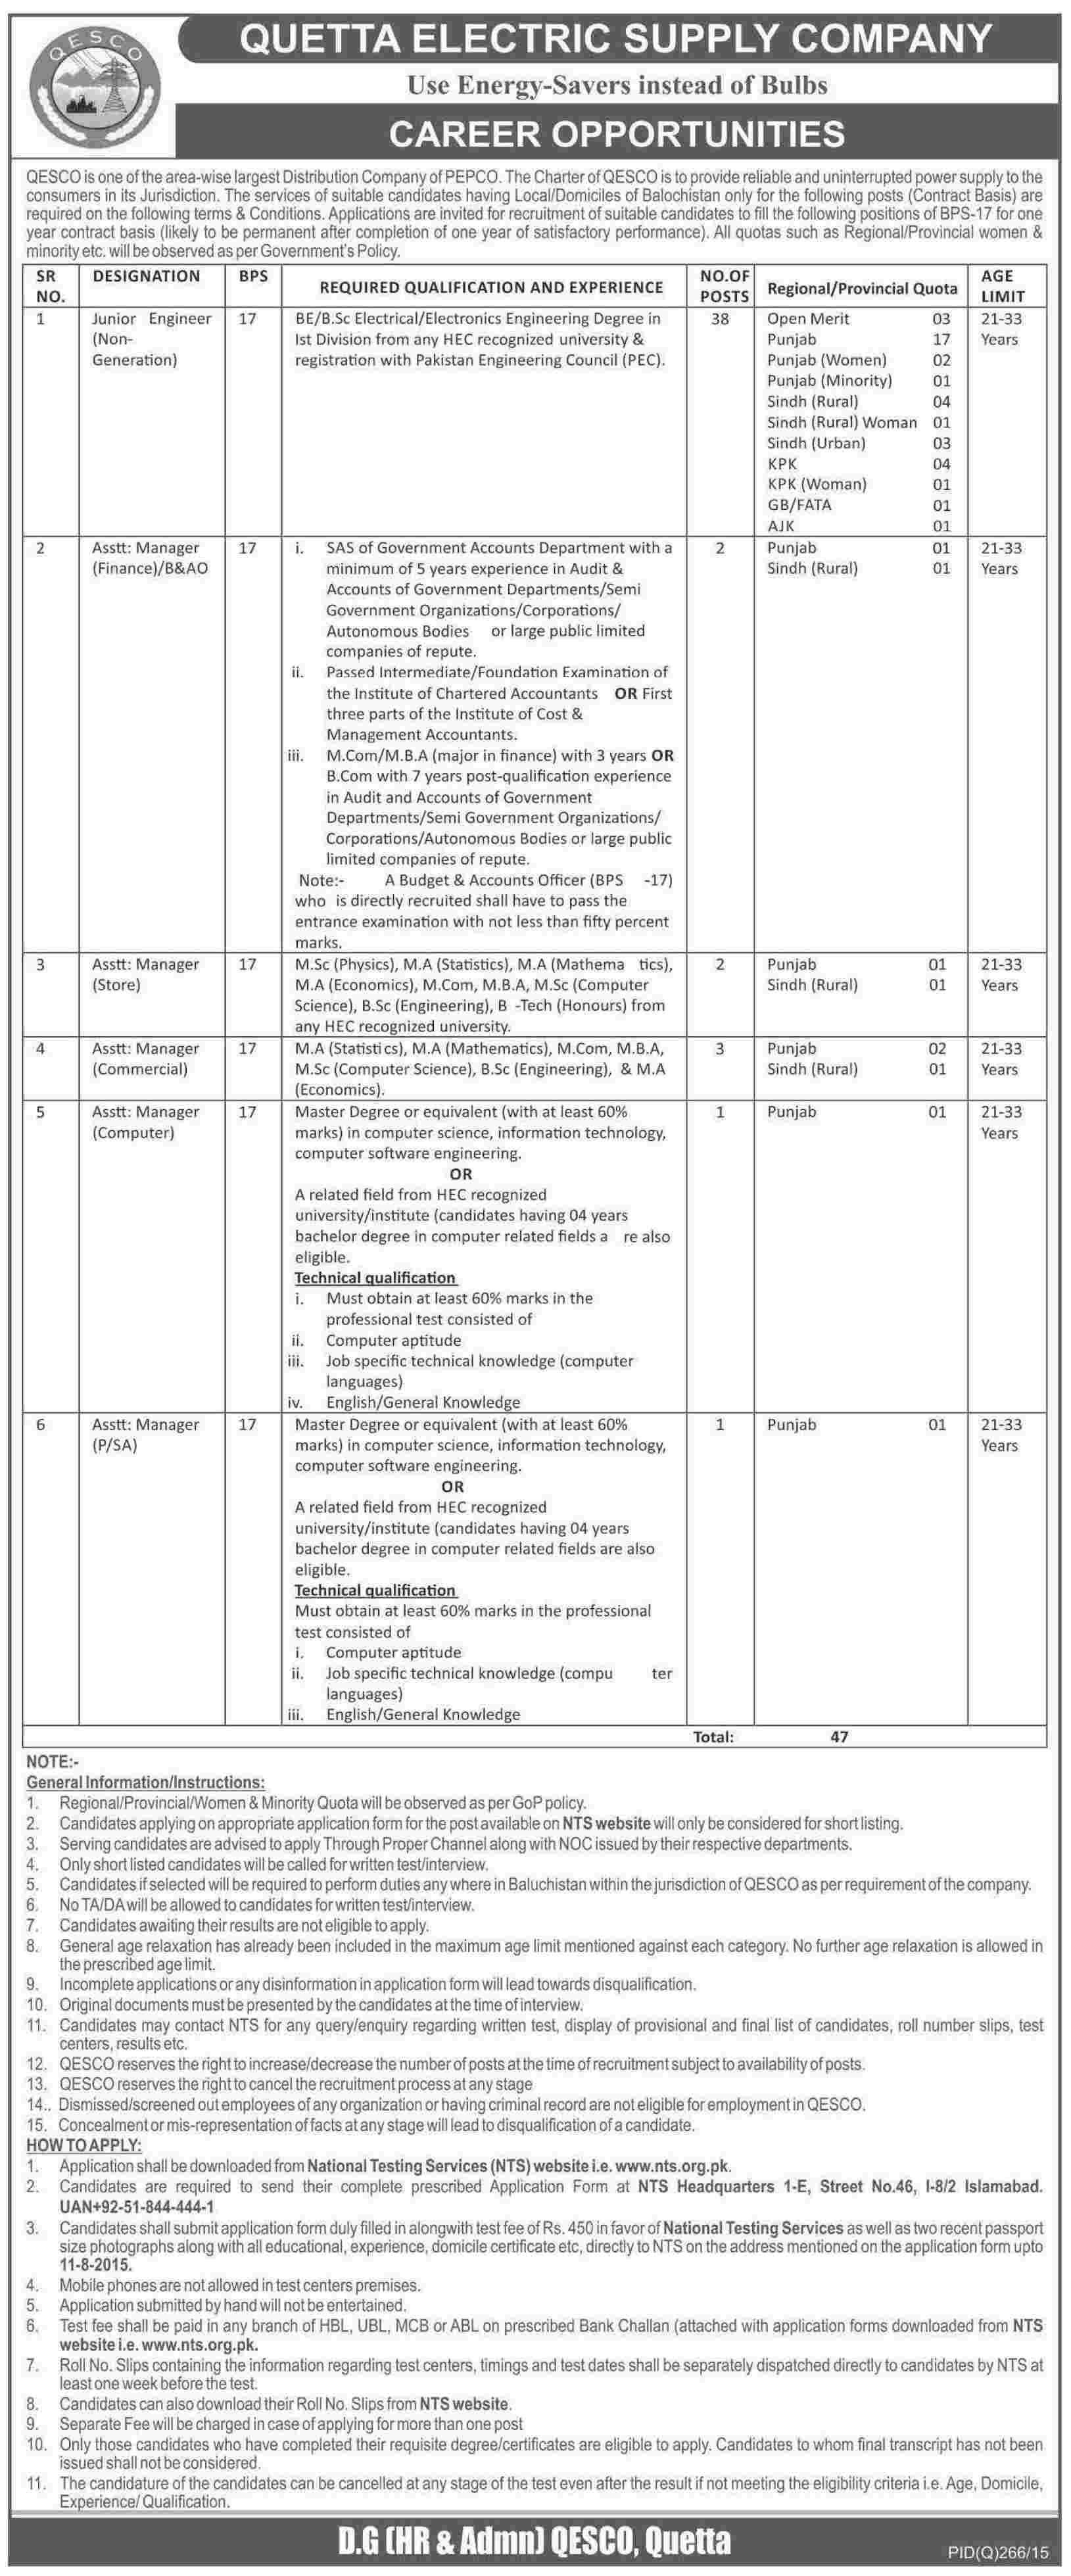 Quetta Electric Qesco Jobs 2015 July Engineer Asst Manager Nts